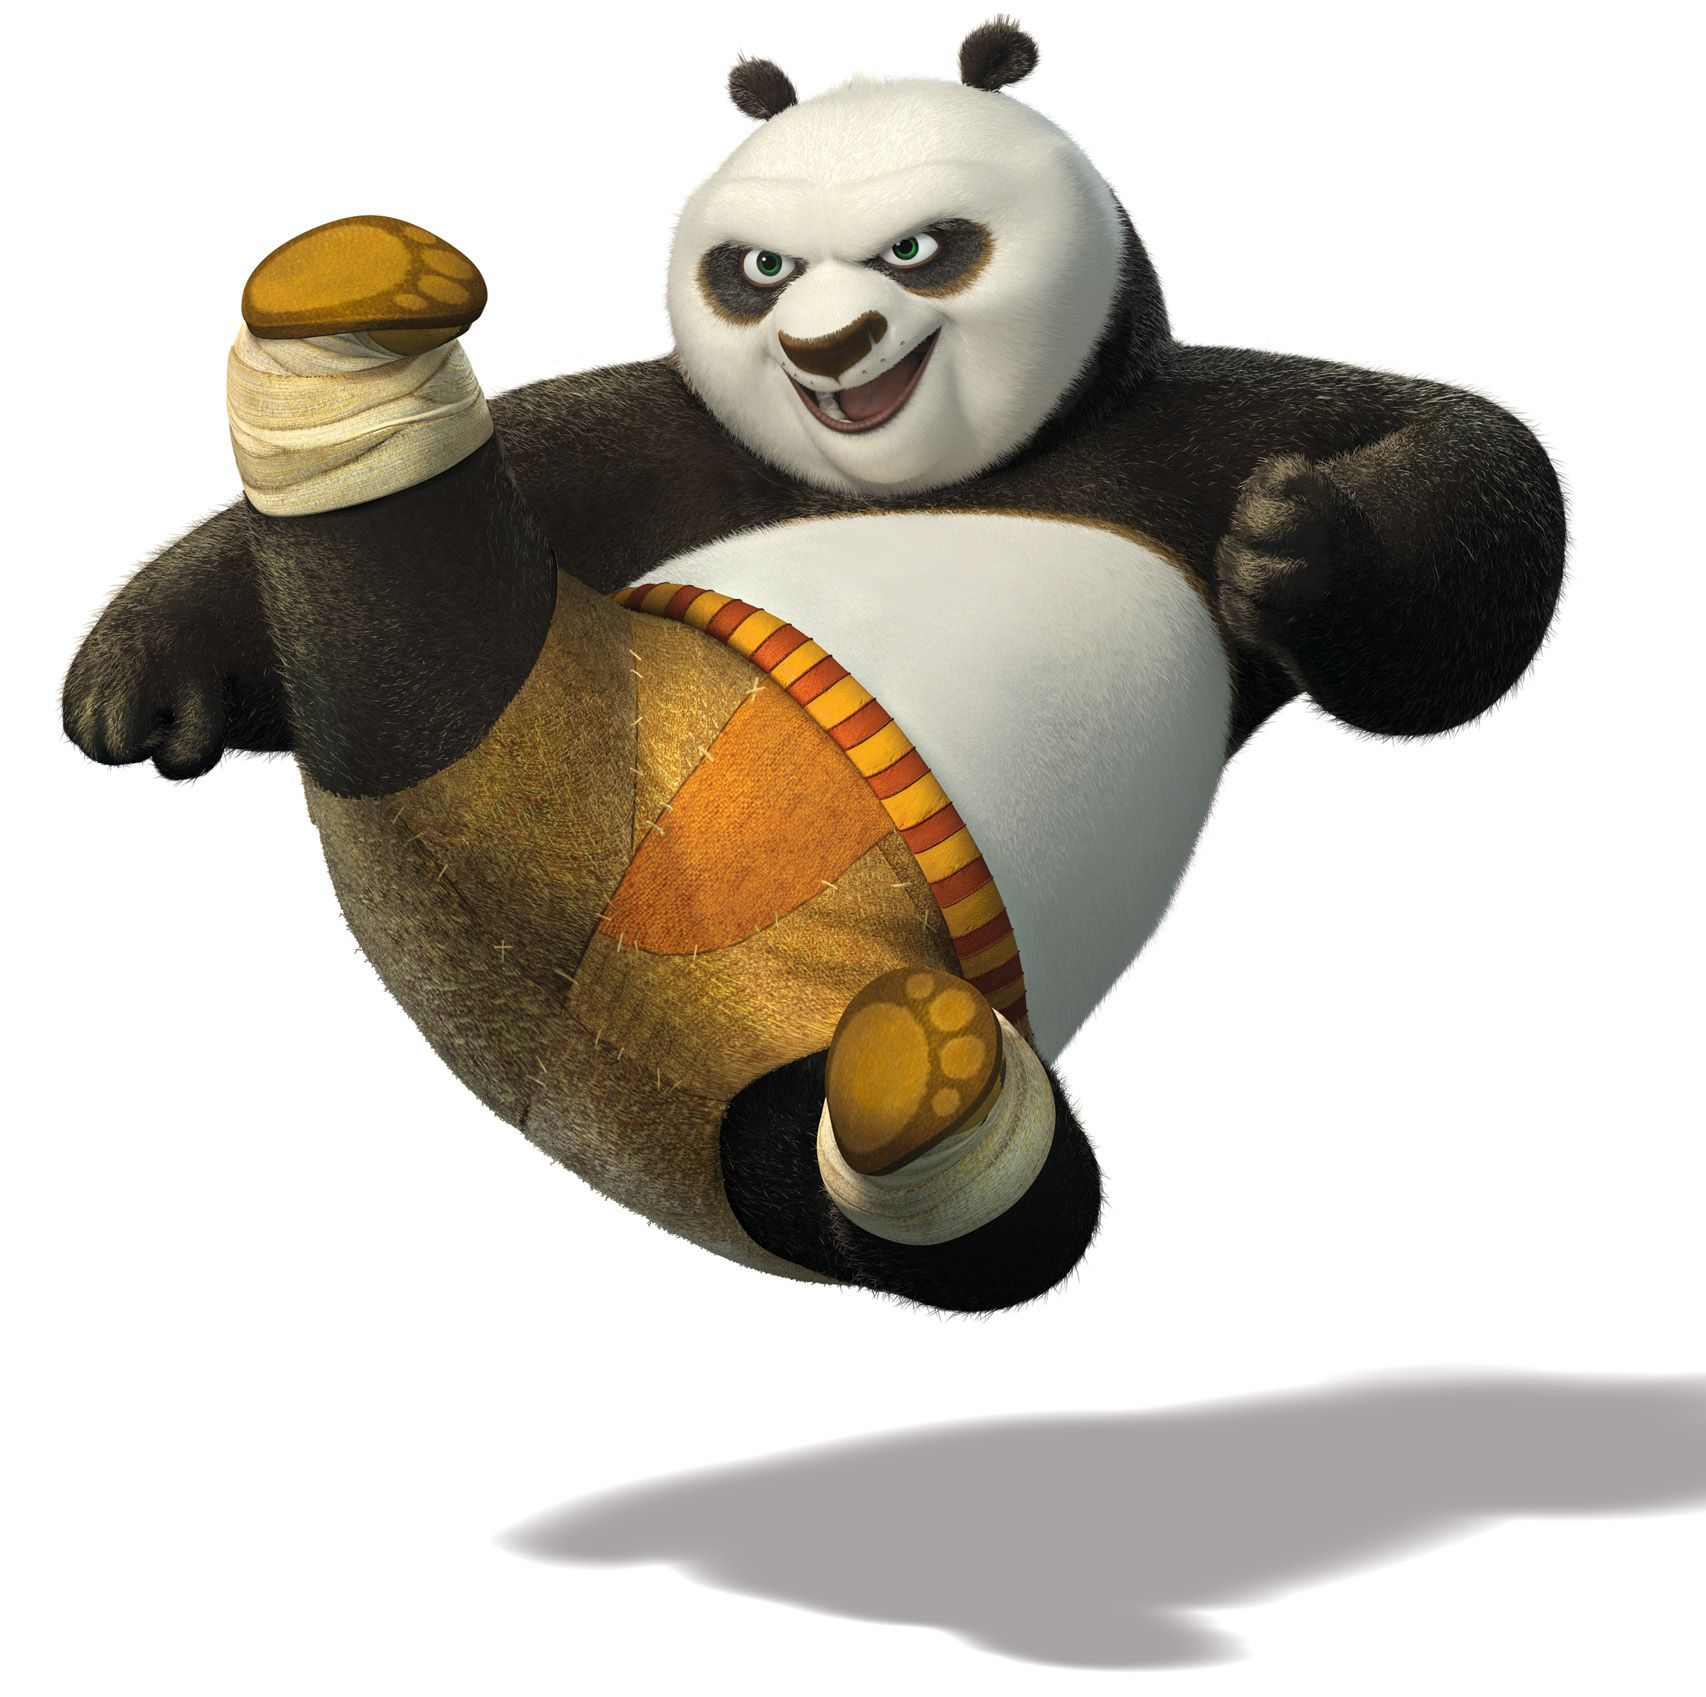 po kung fu panda kick